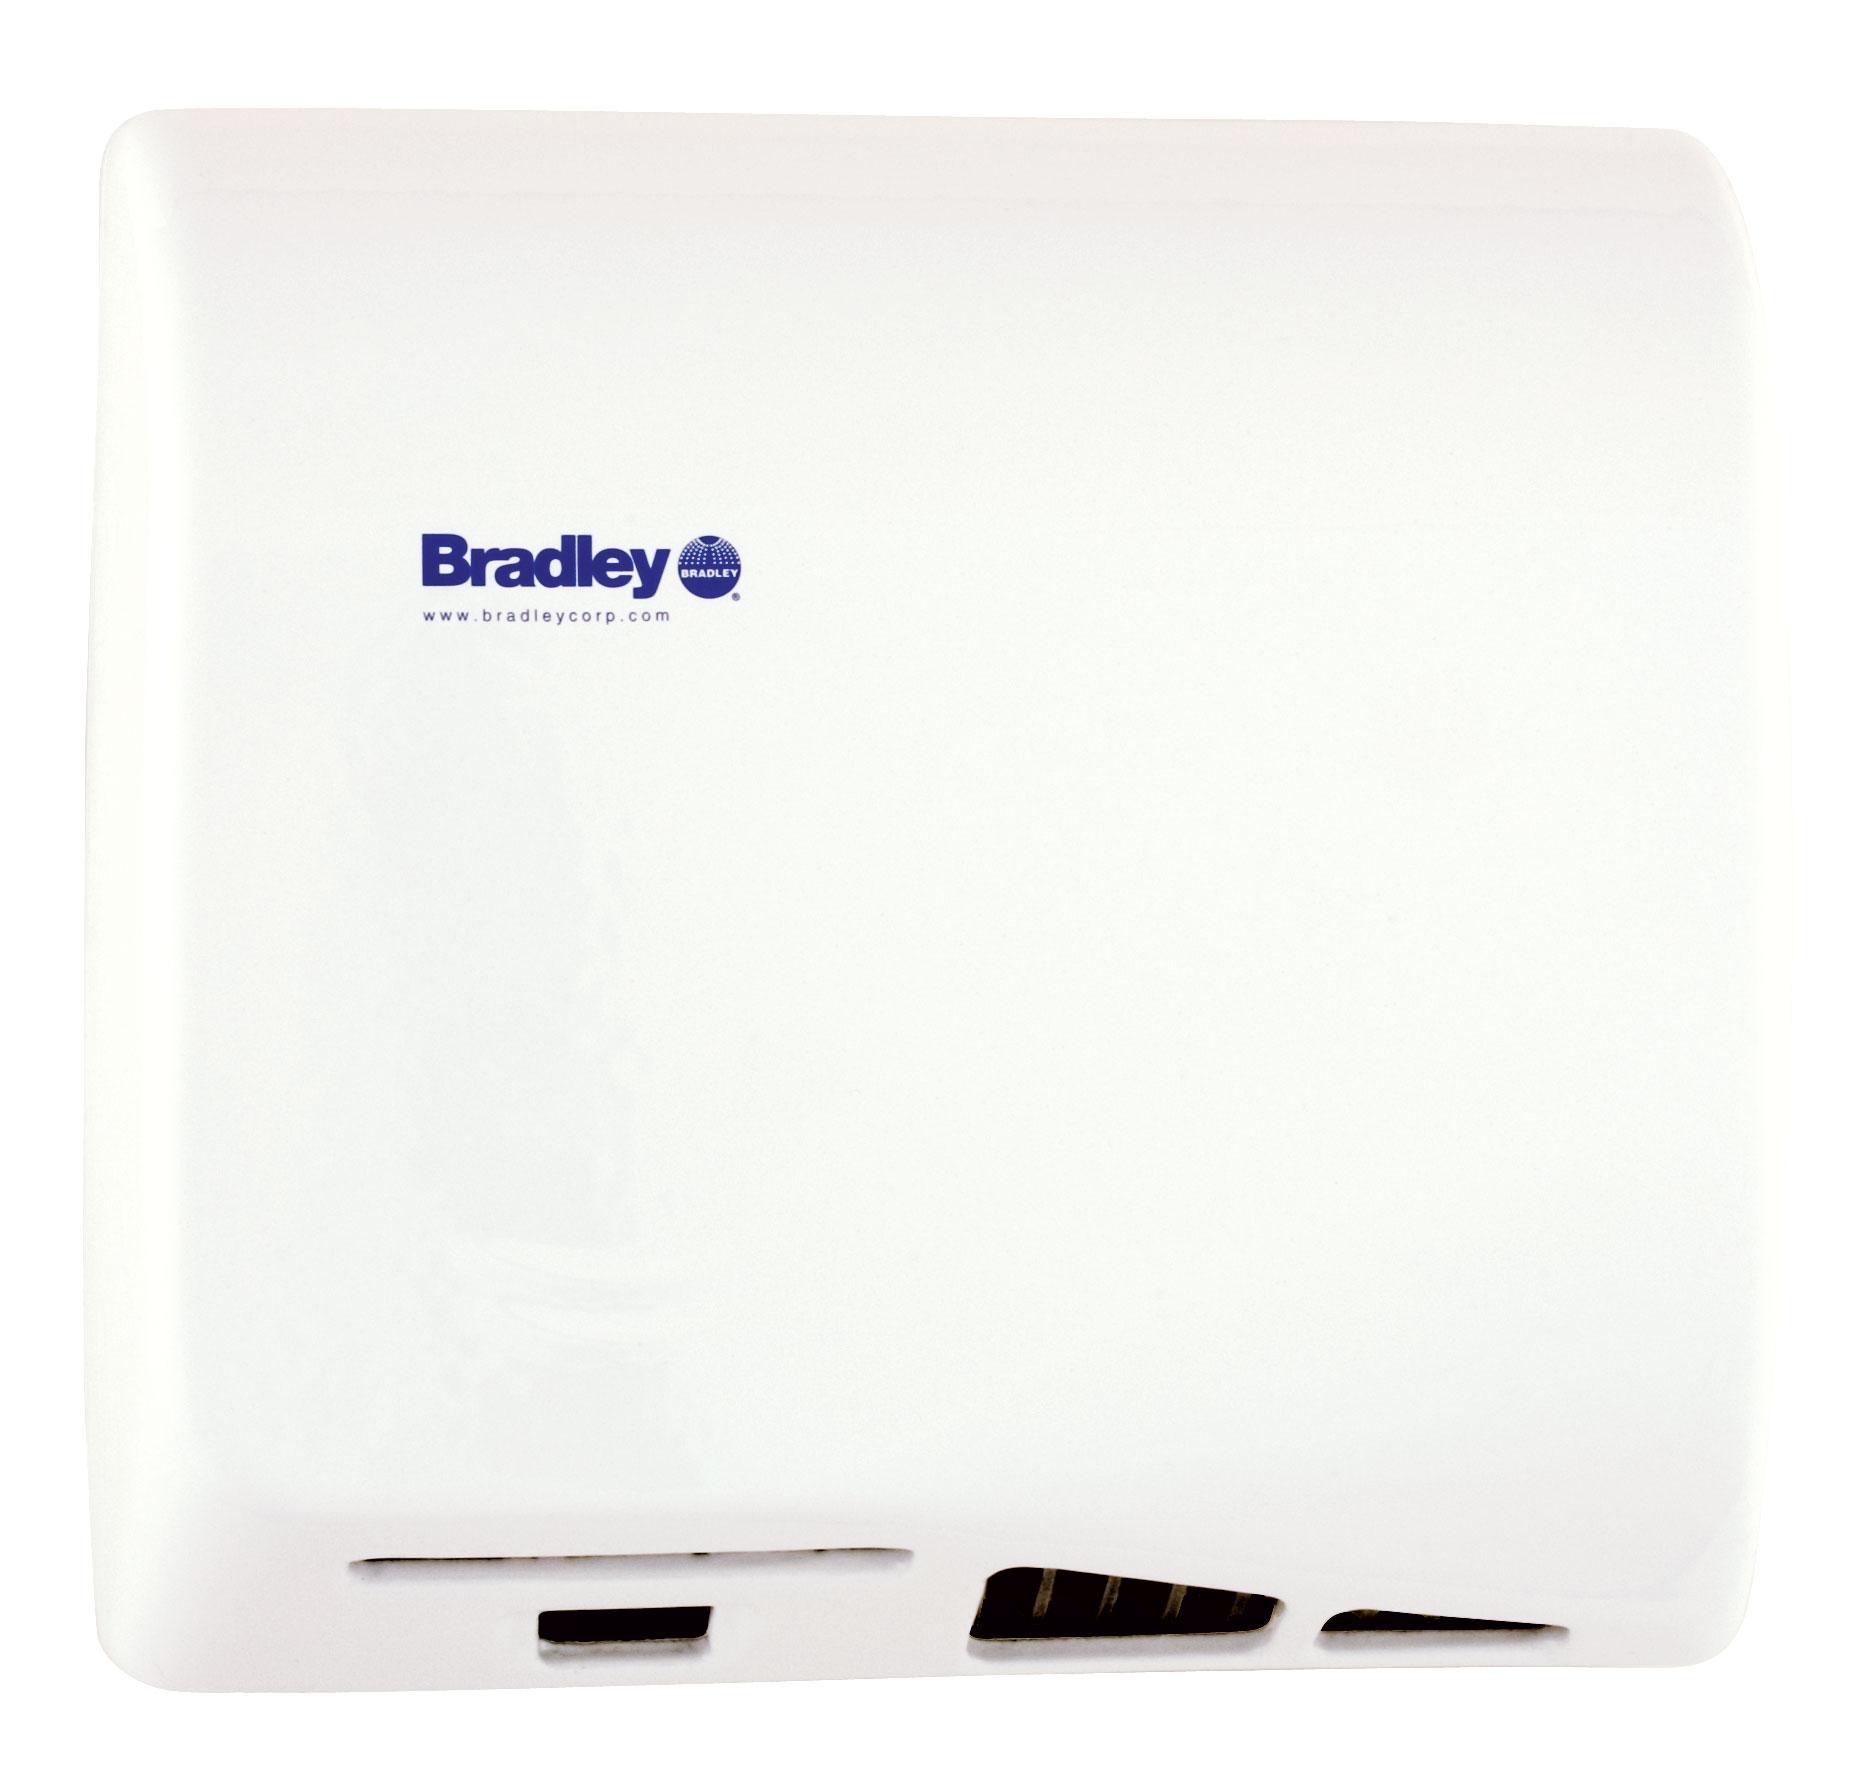 Bradley Aerix 2902-2873 White Adjustable Sensor-Operated Hand Dryer